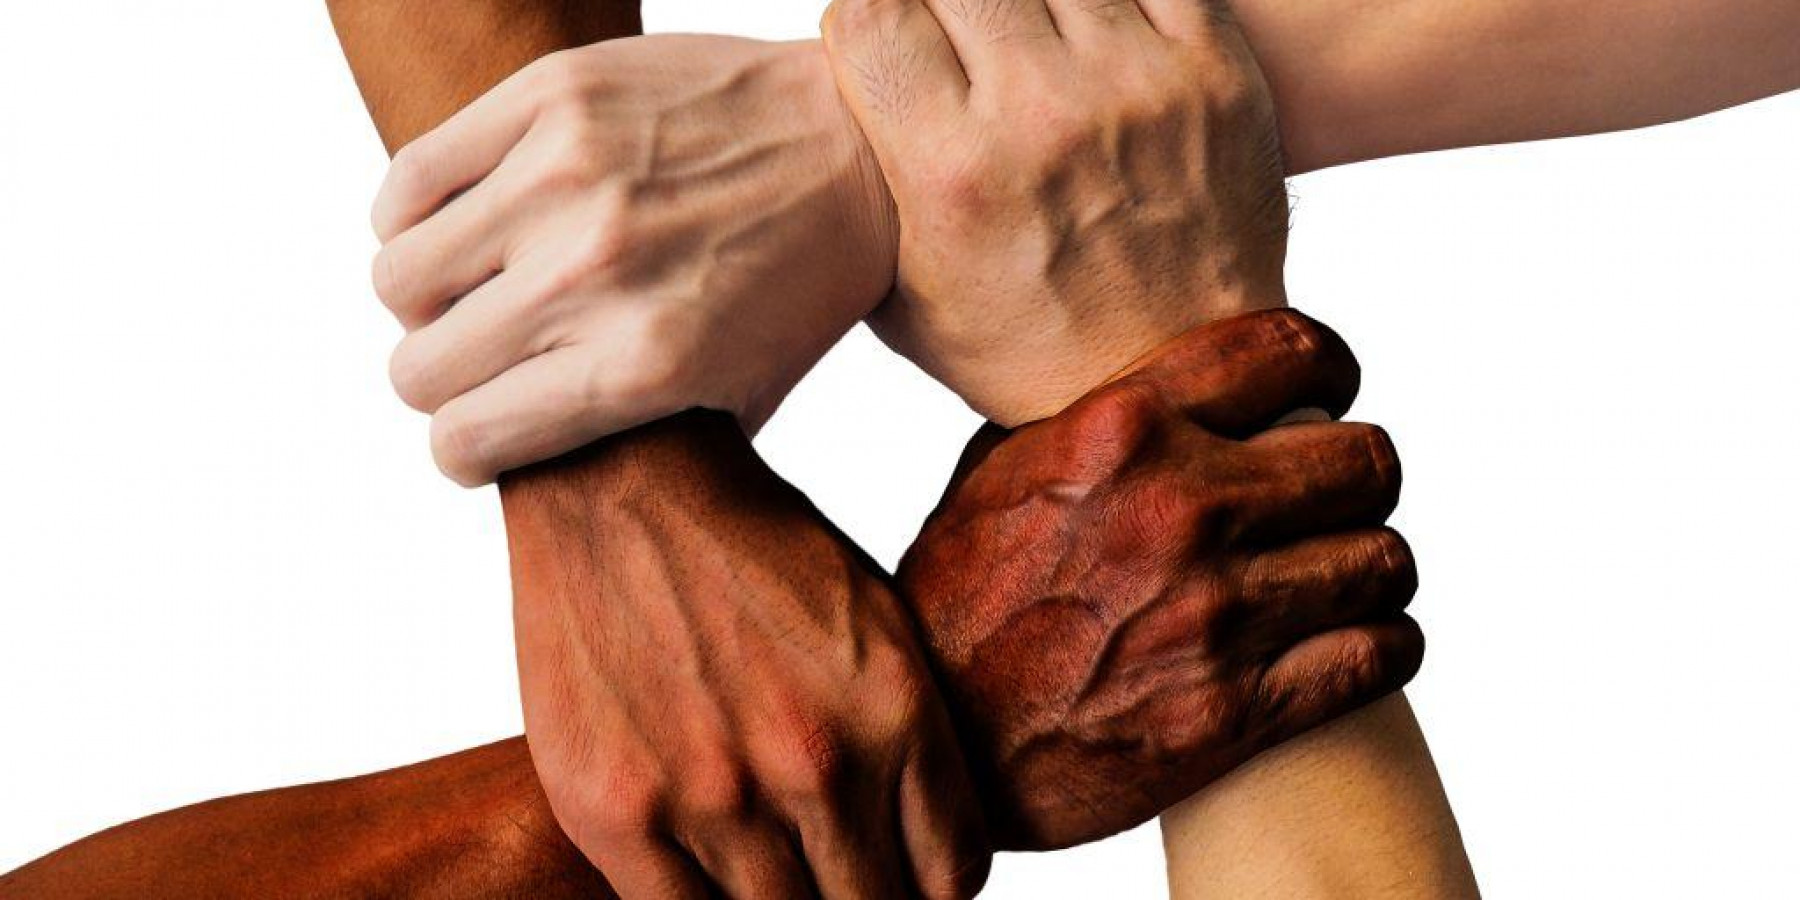 Selbstbestimmt leben trotz Rassismus-Erfahrung